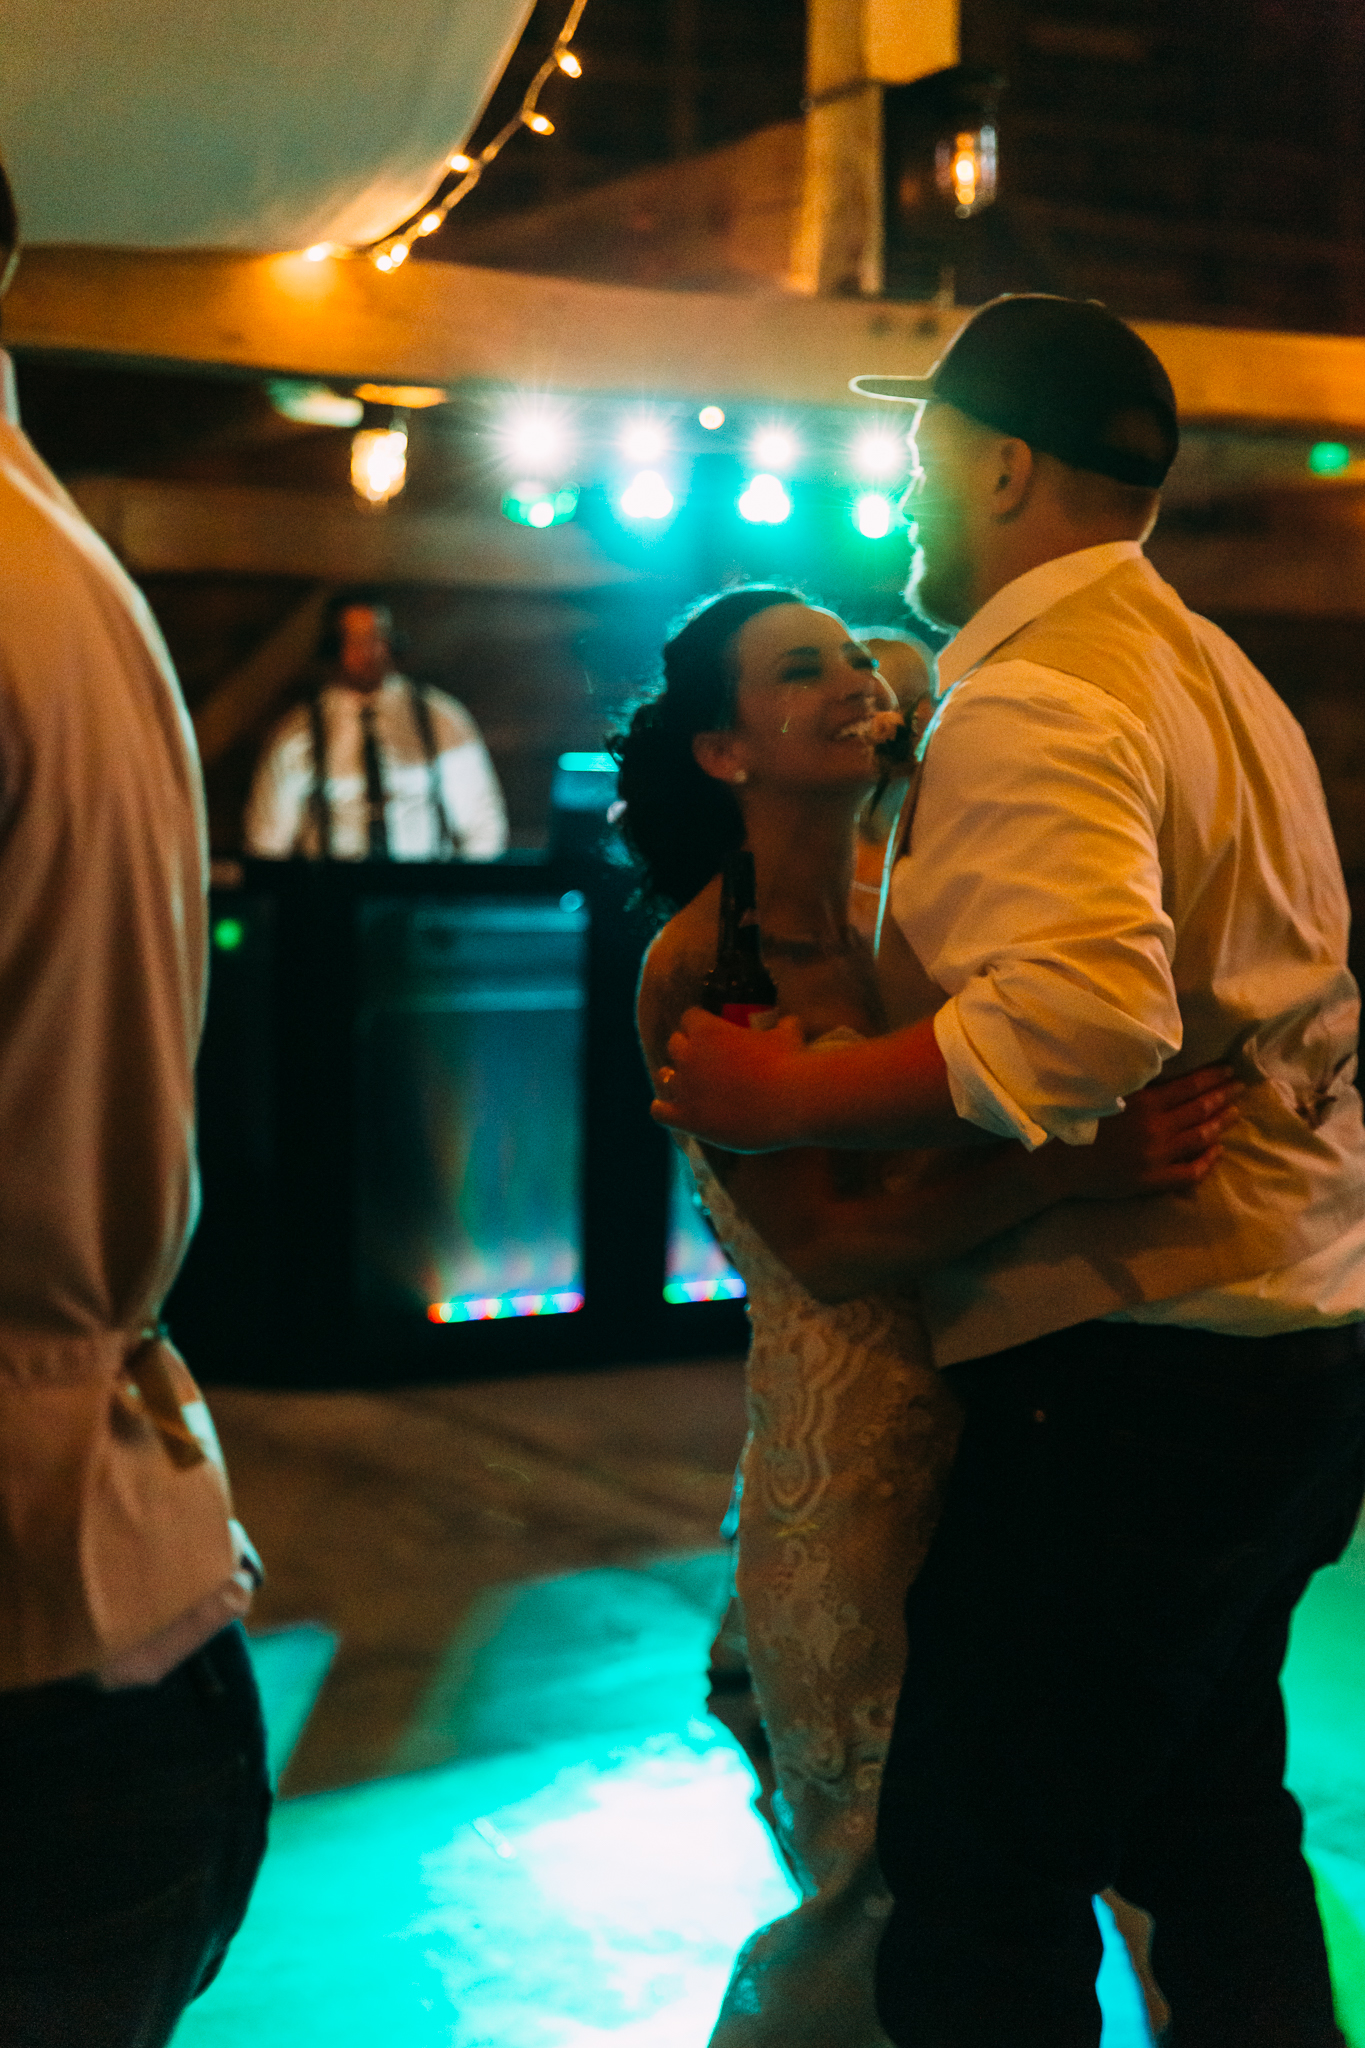 maine-couple-dancing-joyful-photography.jpg